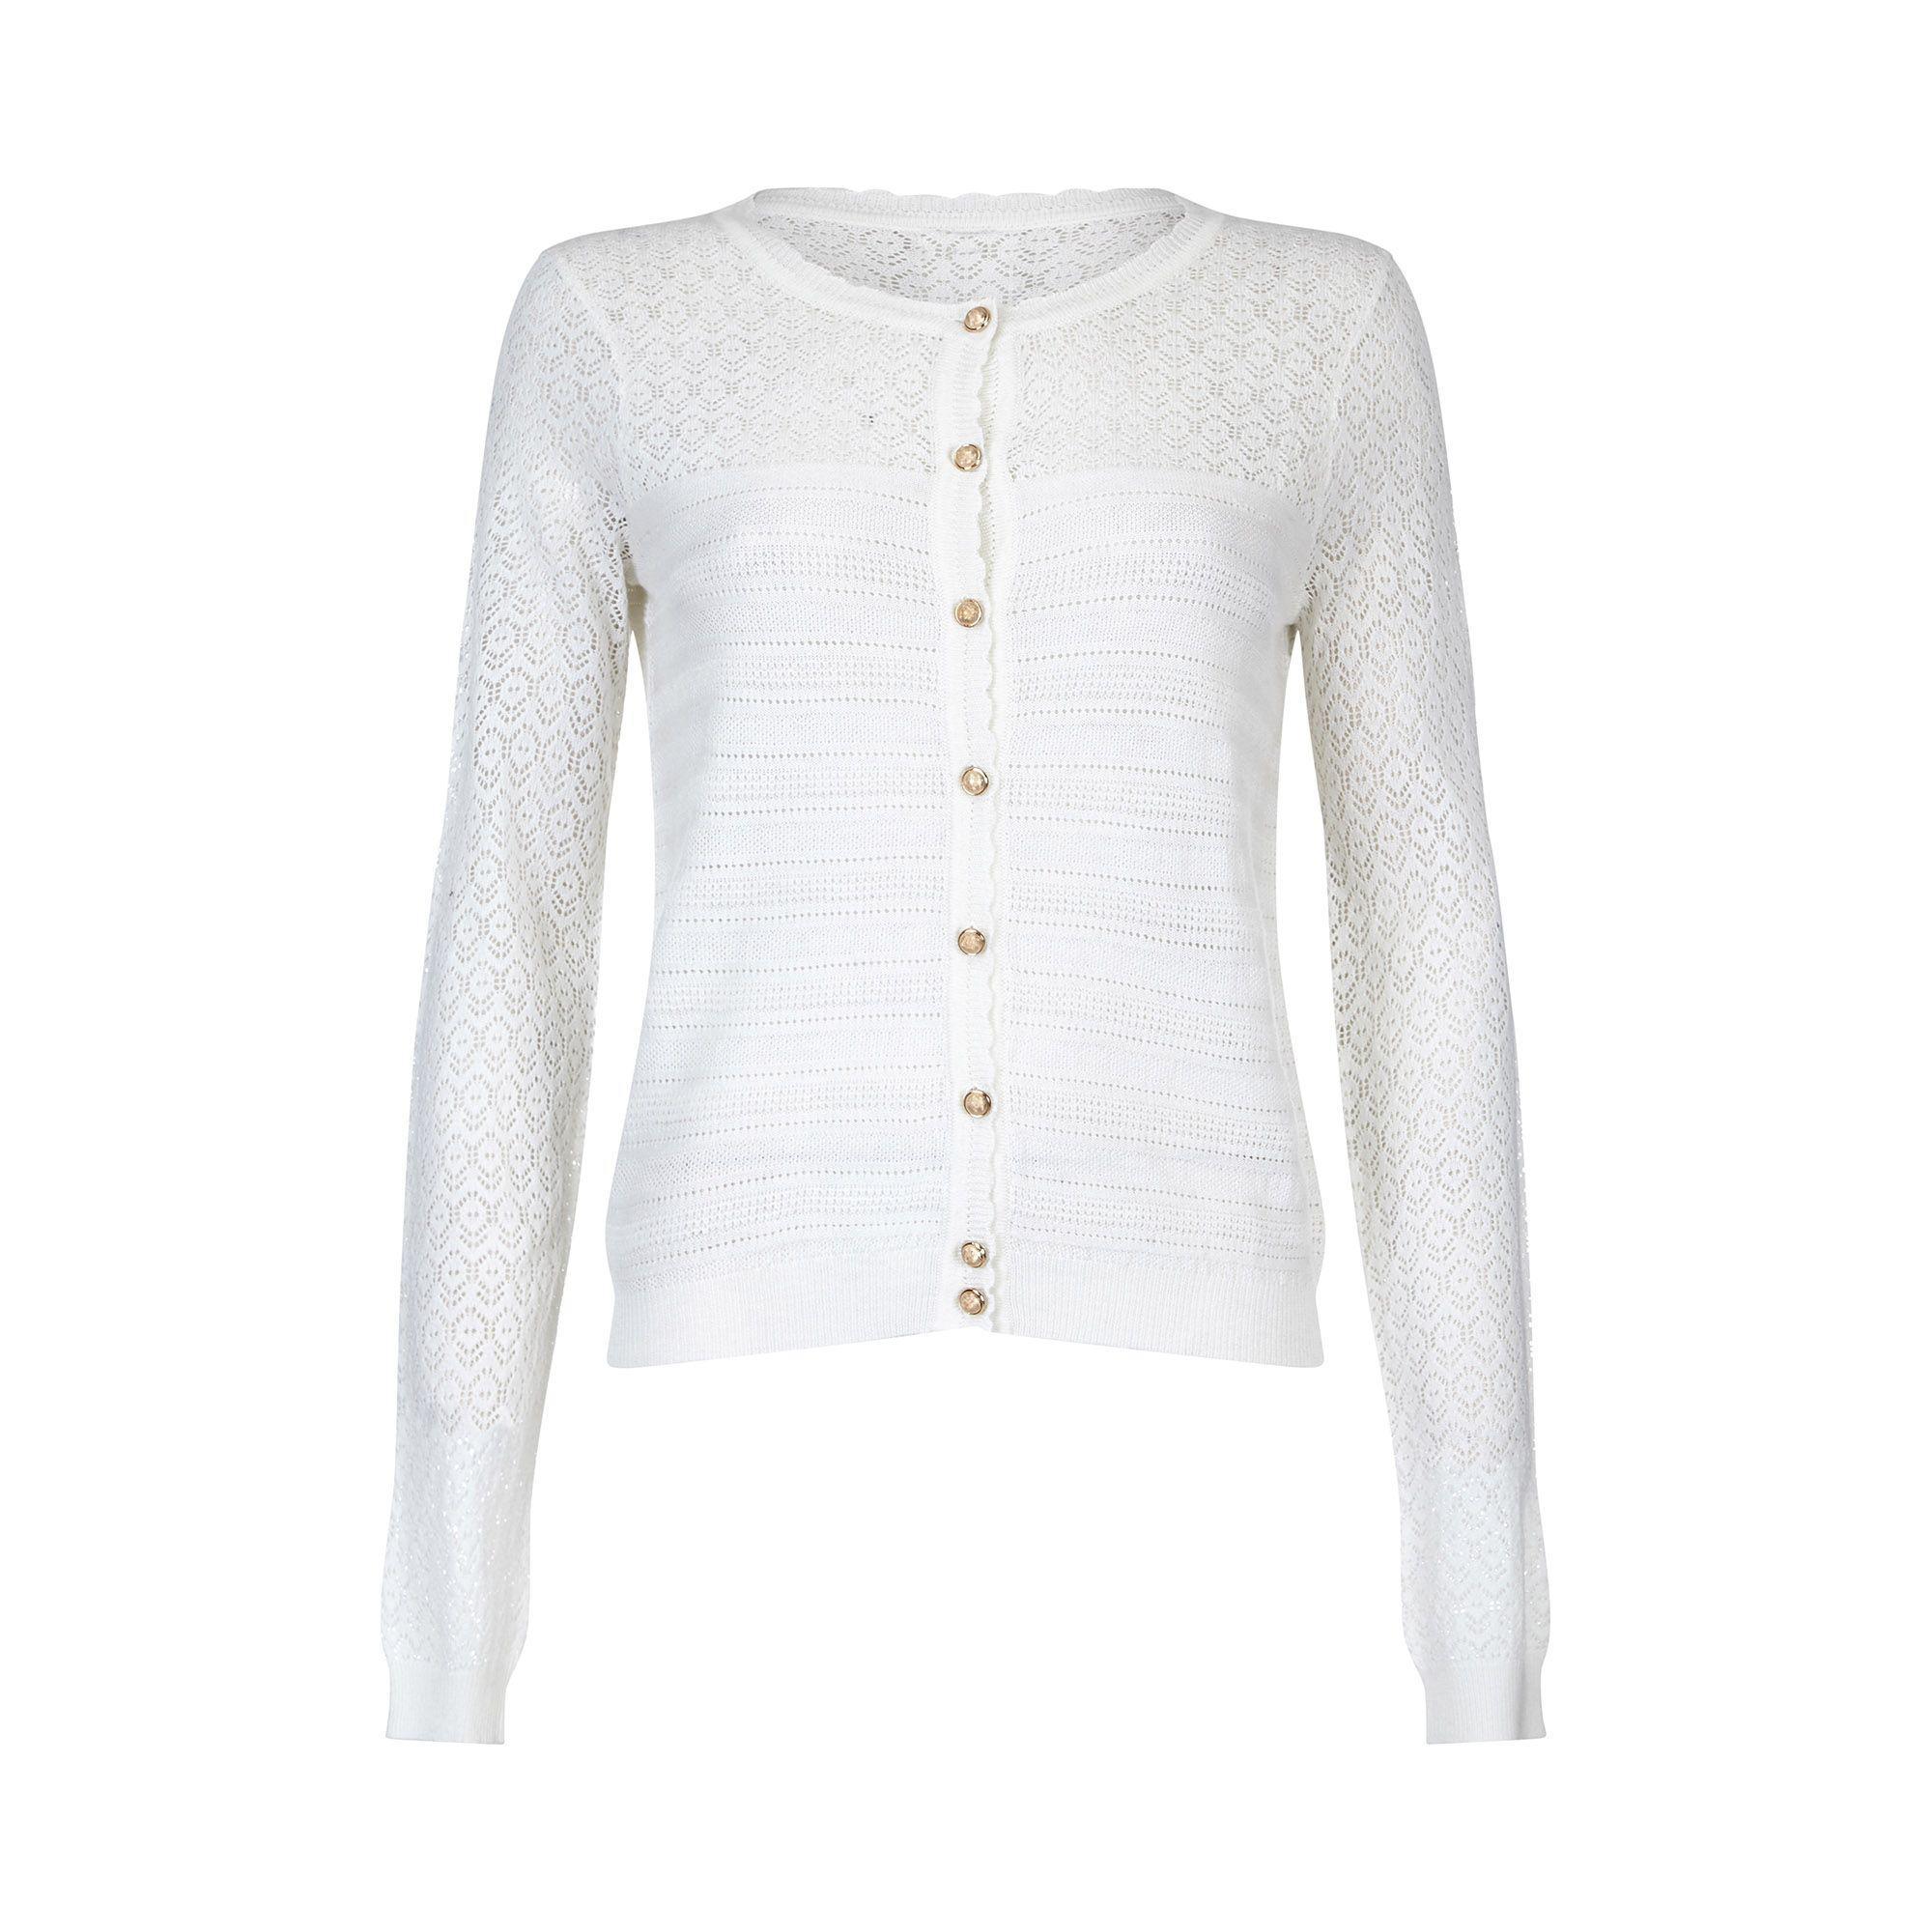 372ef8259d1 Yumi  - White Ivory Ripple Stitch Lace Cardigan - Lyst. View fullscreen